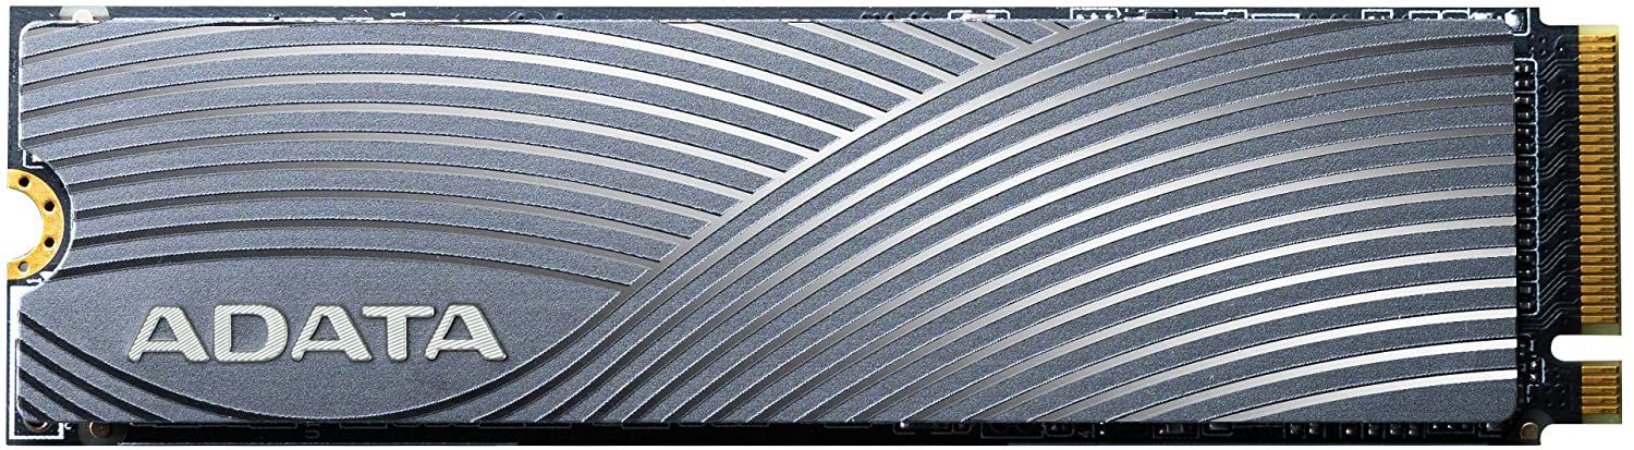 SSD ADATA SWORDFISH, 2TB, M.2 PCIE, LEITURAS: 1800MB/S E GRAVAÇÕES: 1200MB/S - ASWORDFISH-2T-C